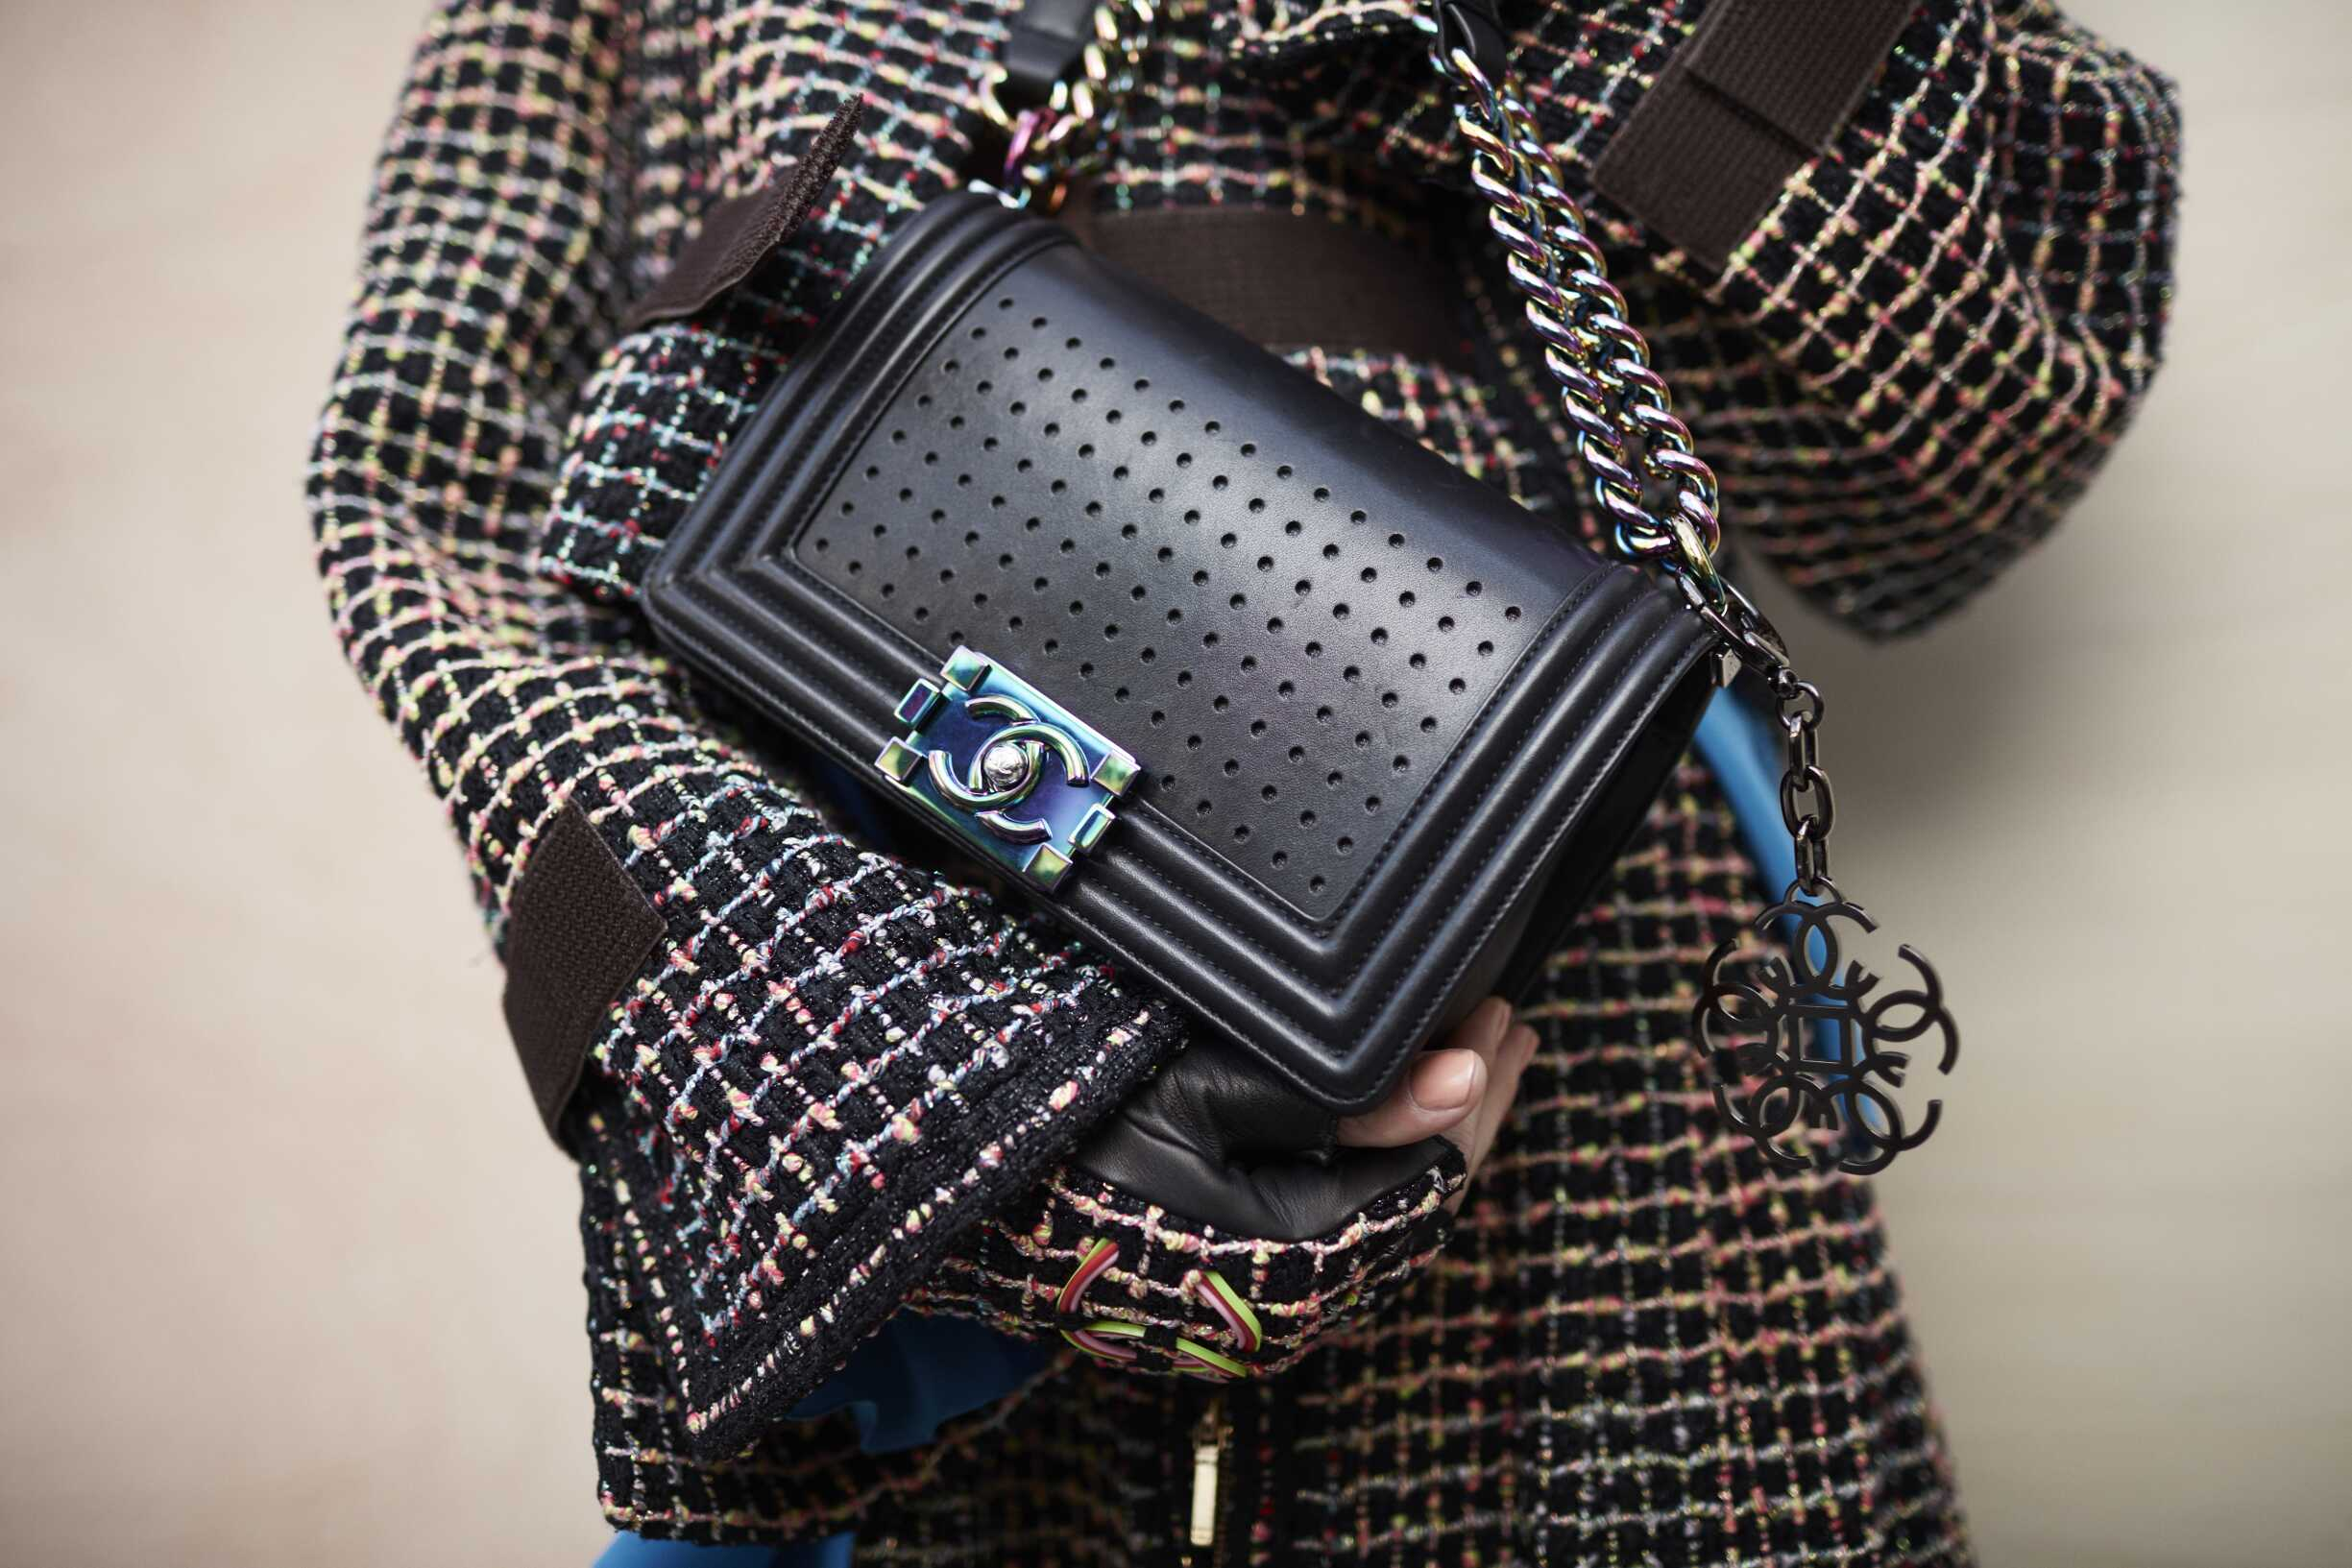 chanel 2017 handbags. chanel woman bag 2017 handbags